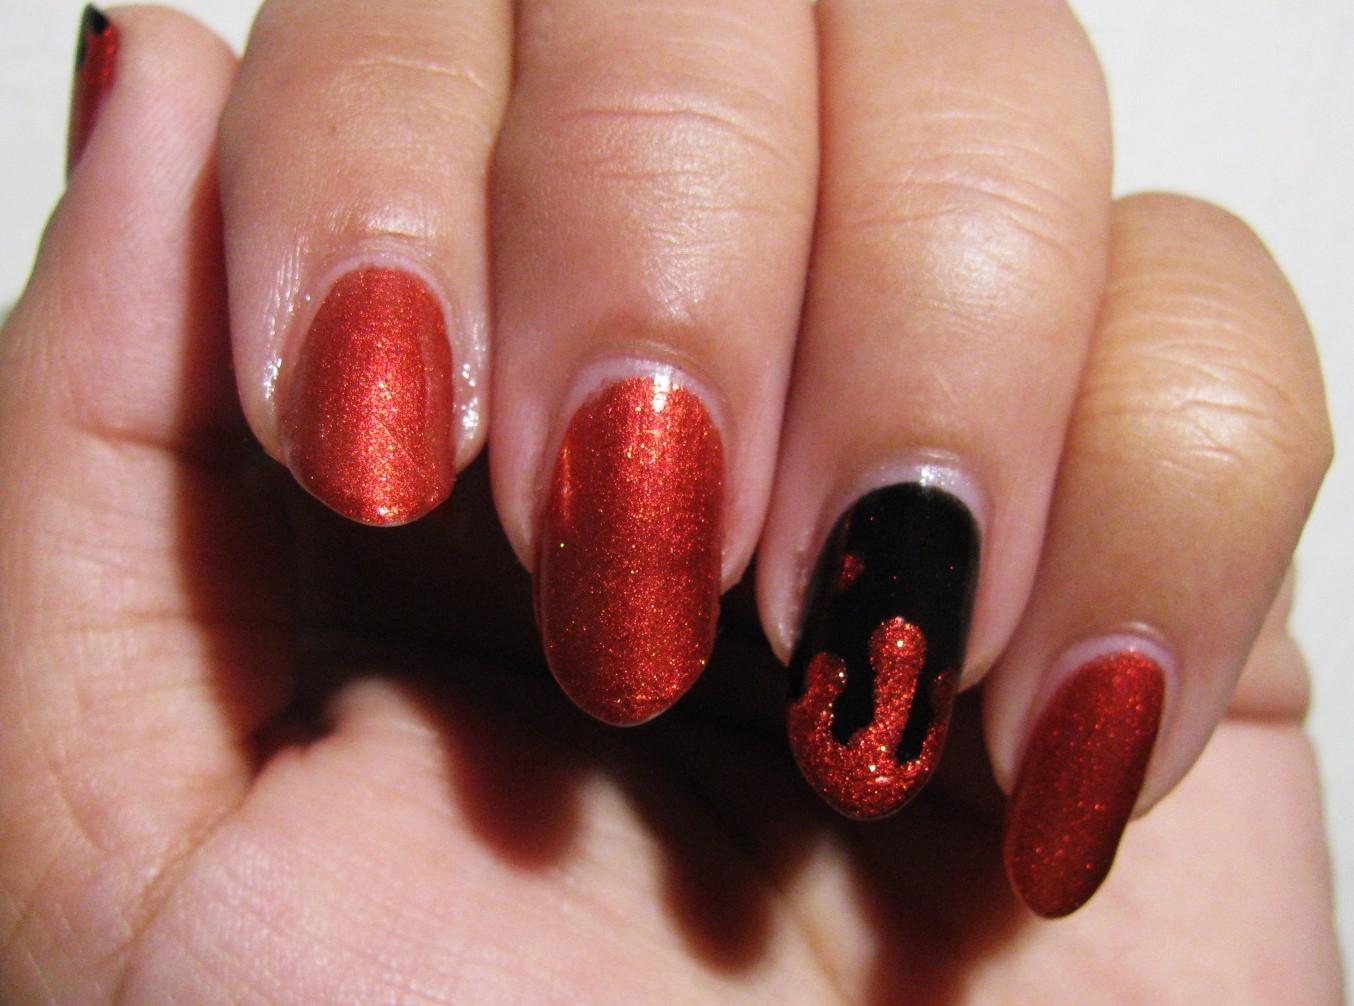 The Super Secret Nail Blog: Easy Halloween Nail Art ...